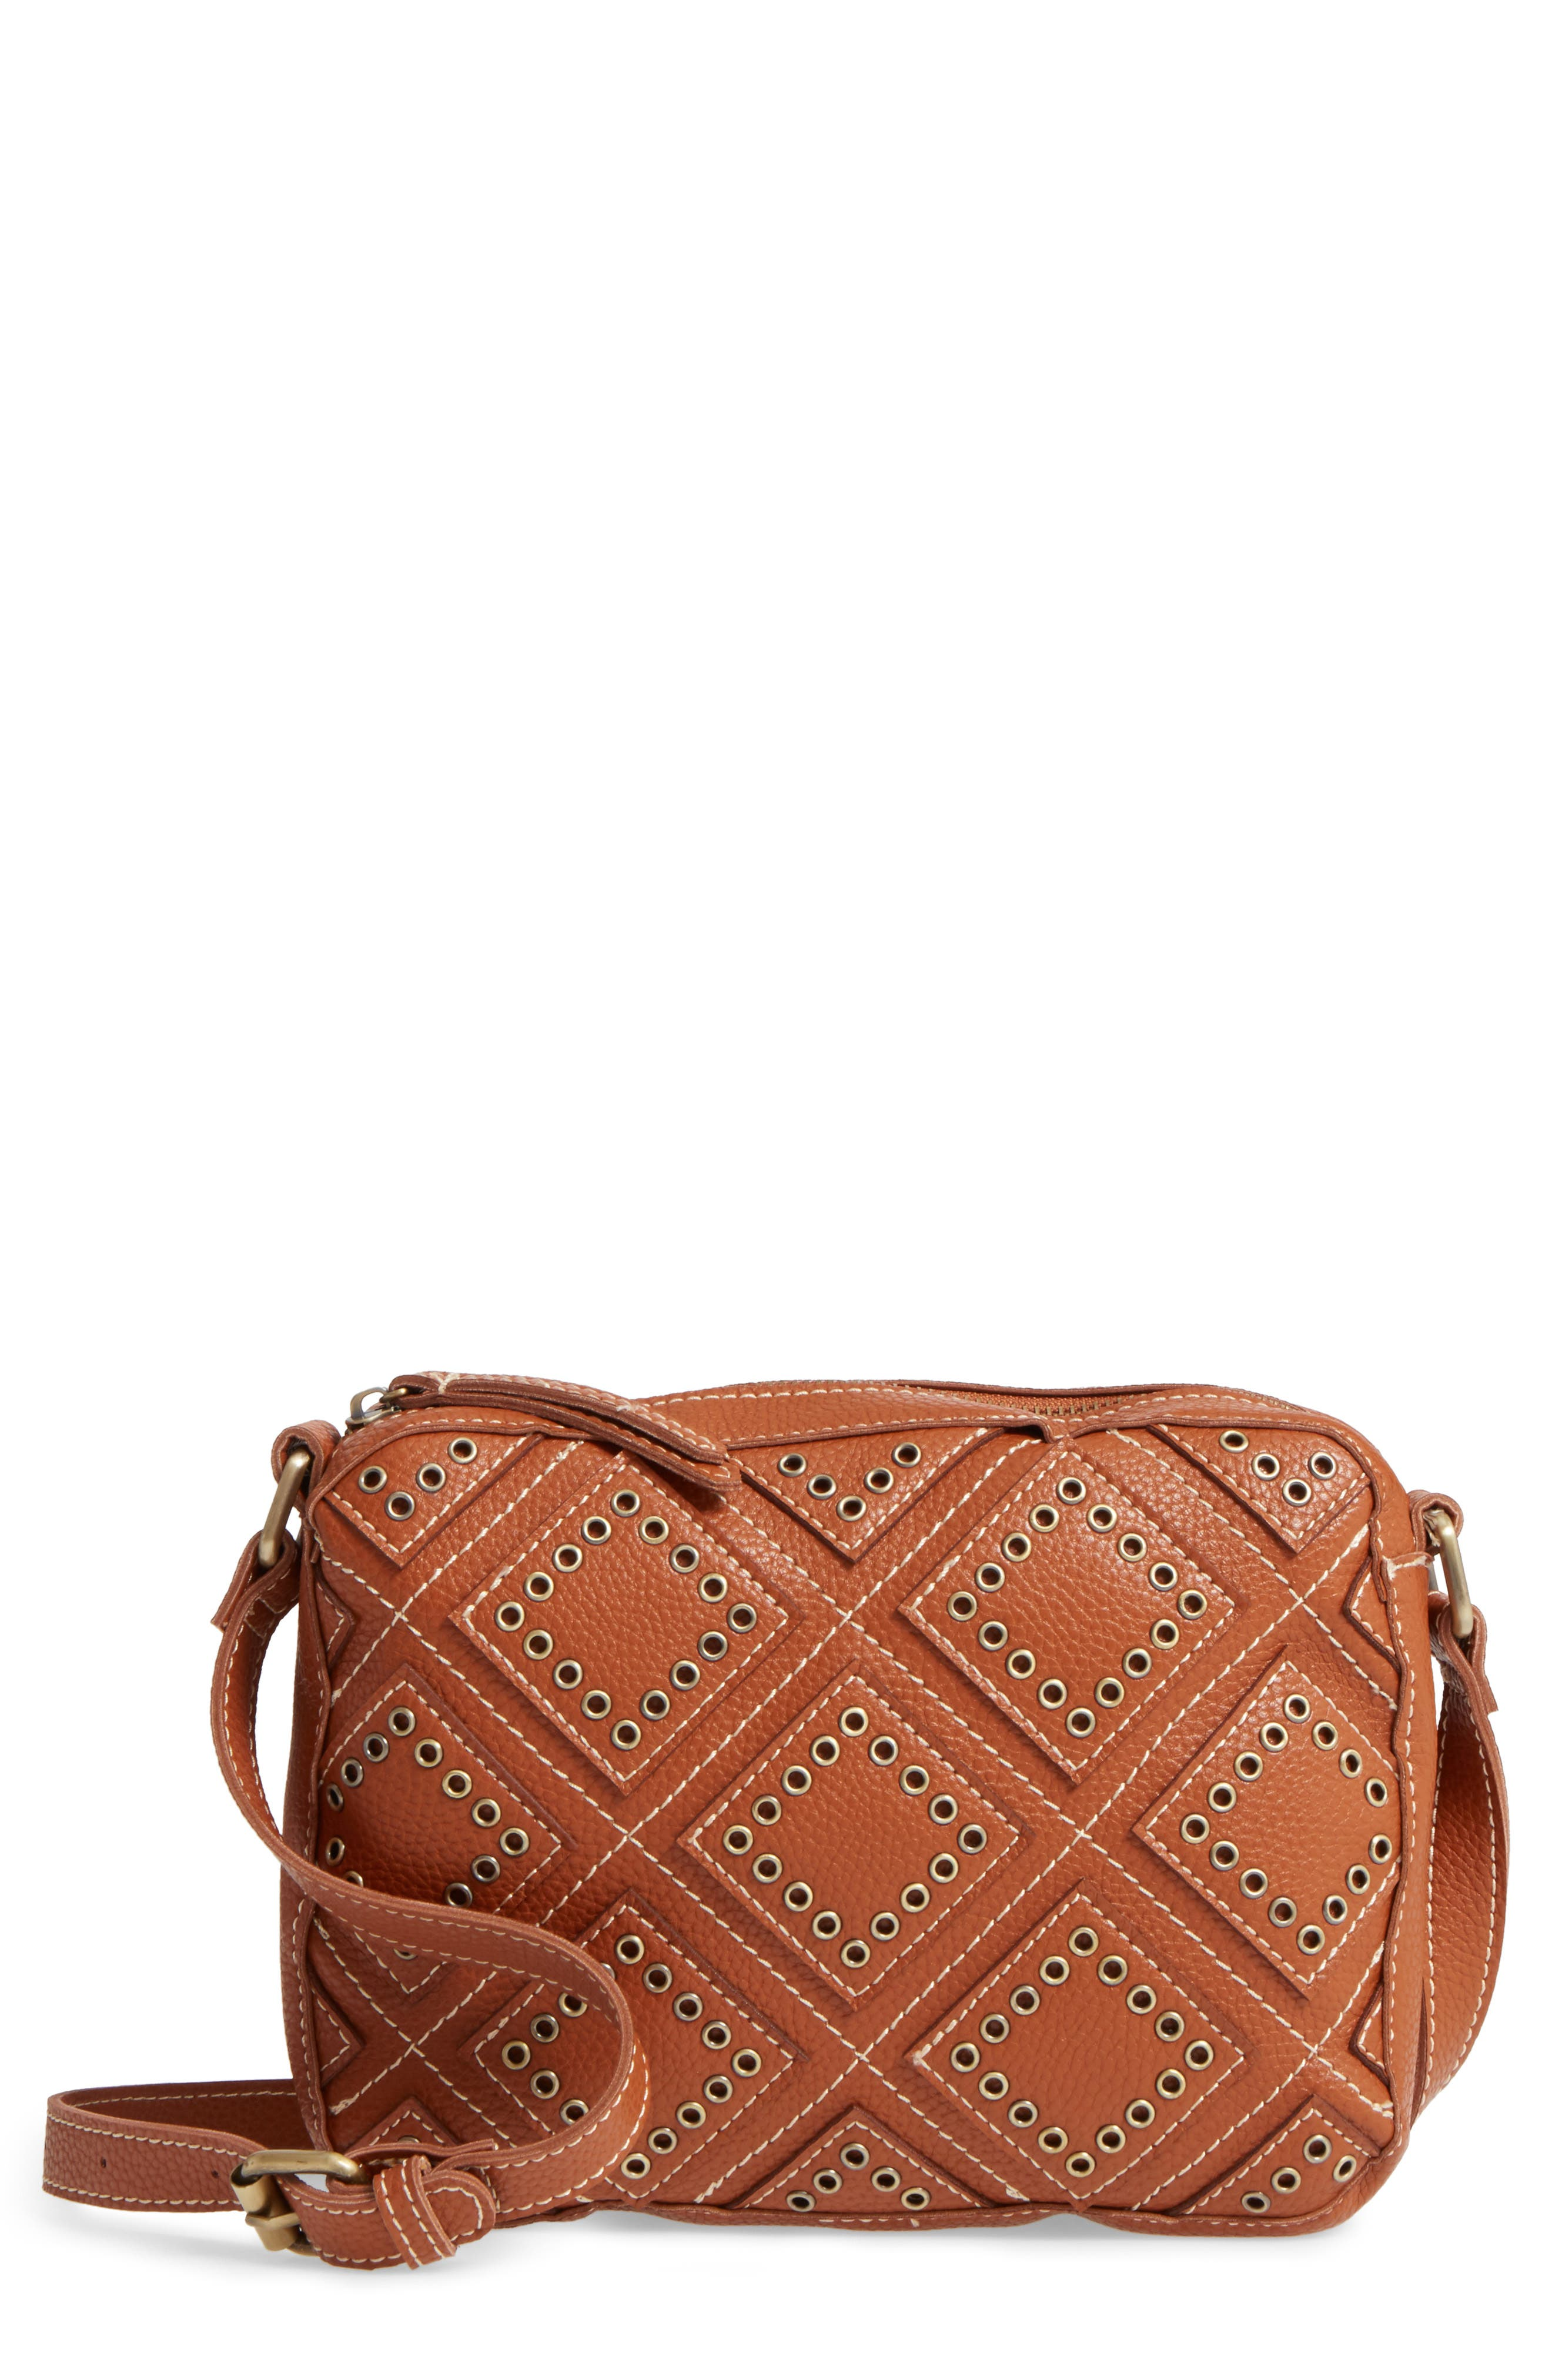 Skylar Faux Leather Crossbody Bag,                         Main,                         color, Saddle